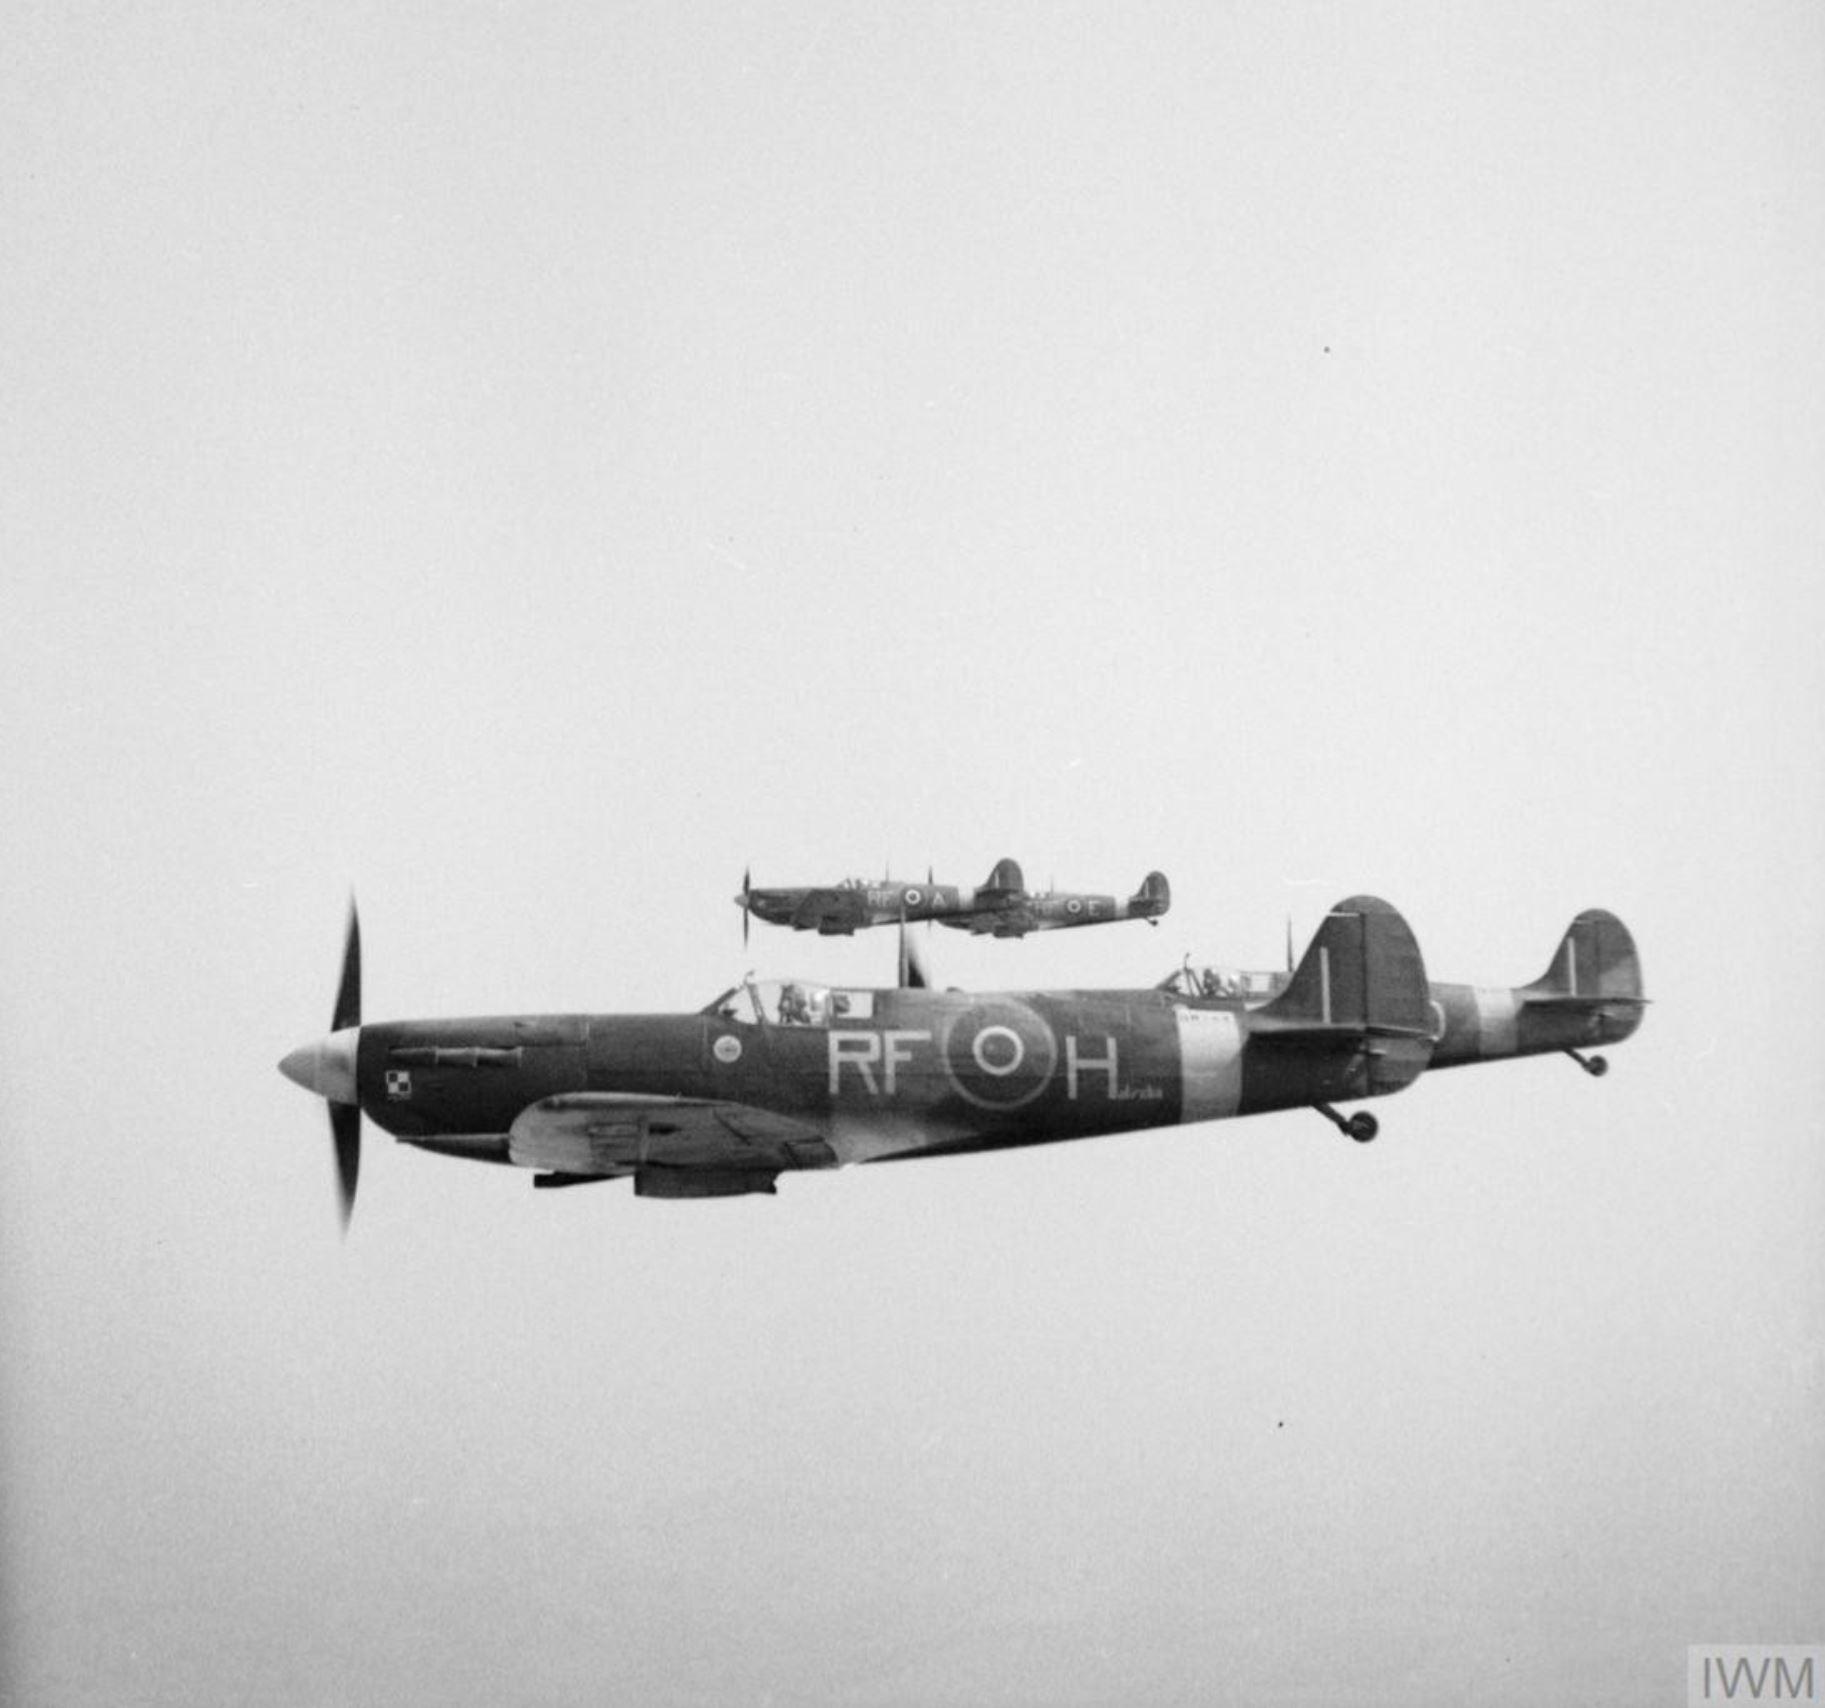 Spitfire MkVb RAF 303 Polish RFH BM144 Halszka escorting Gen Montgomery 17th May 1943 IWM 01